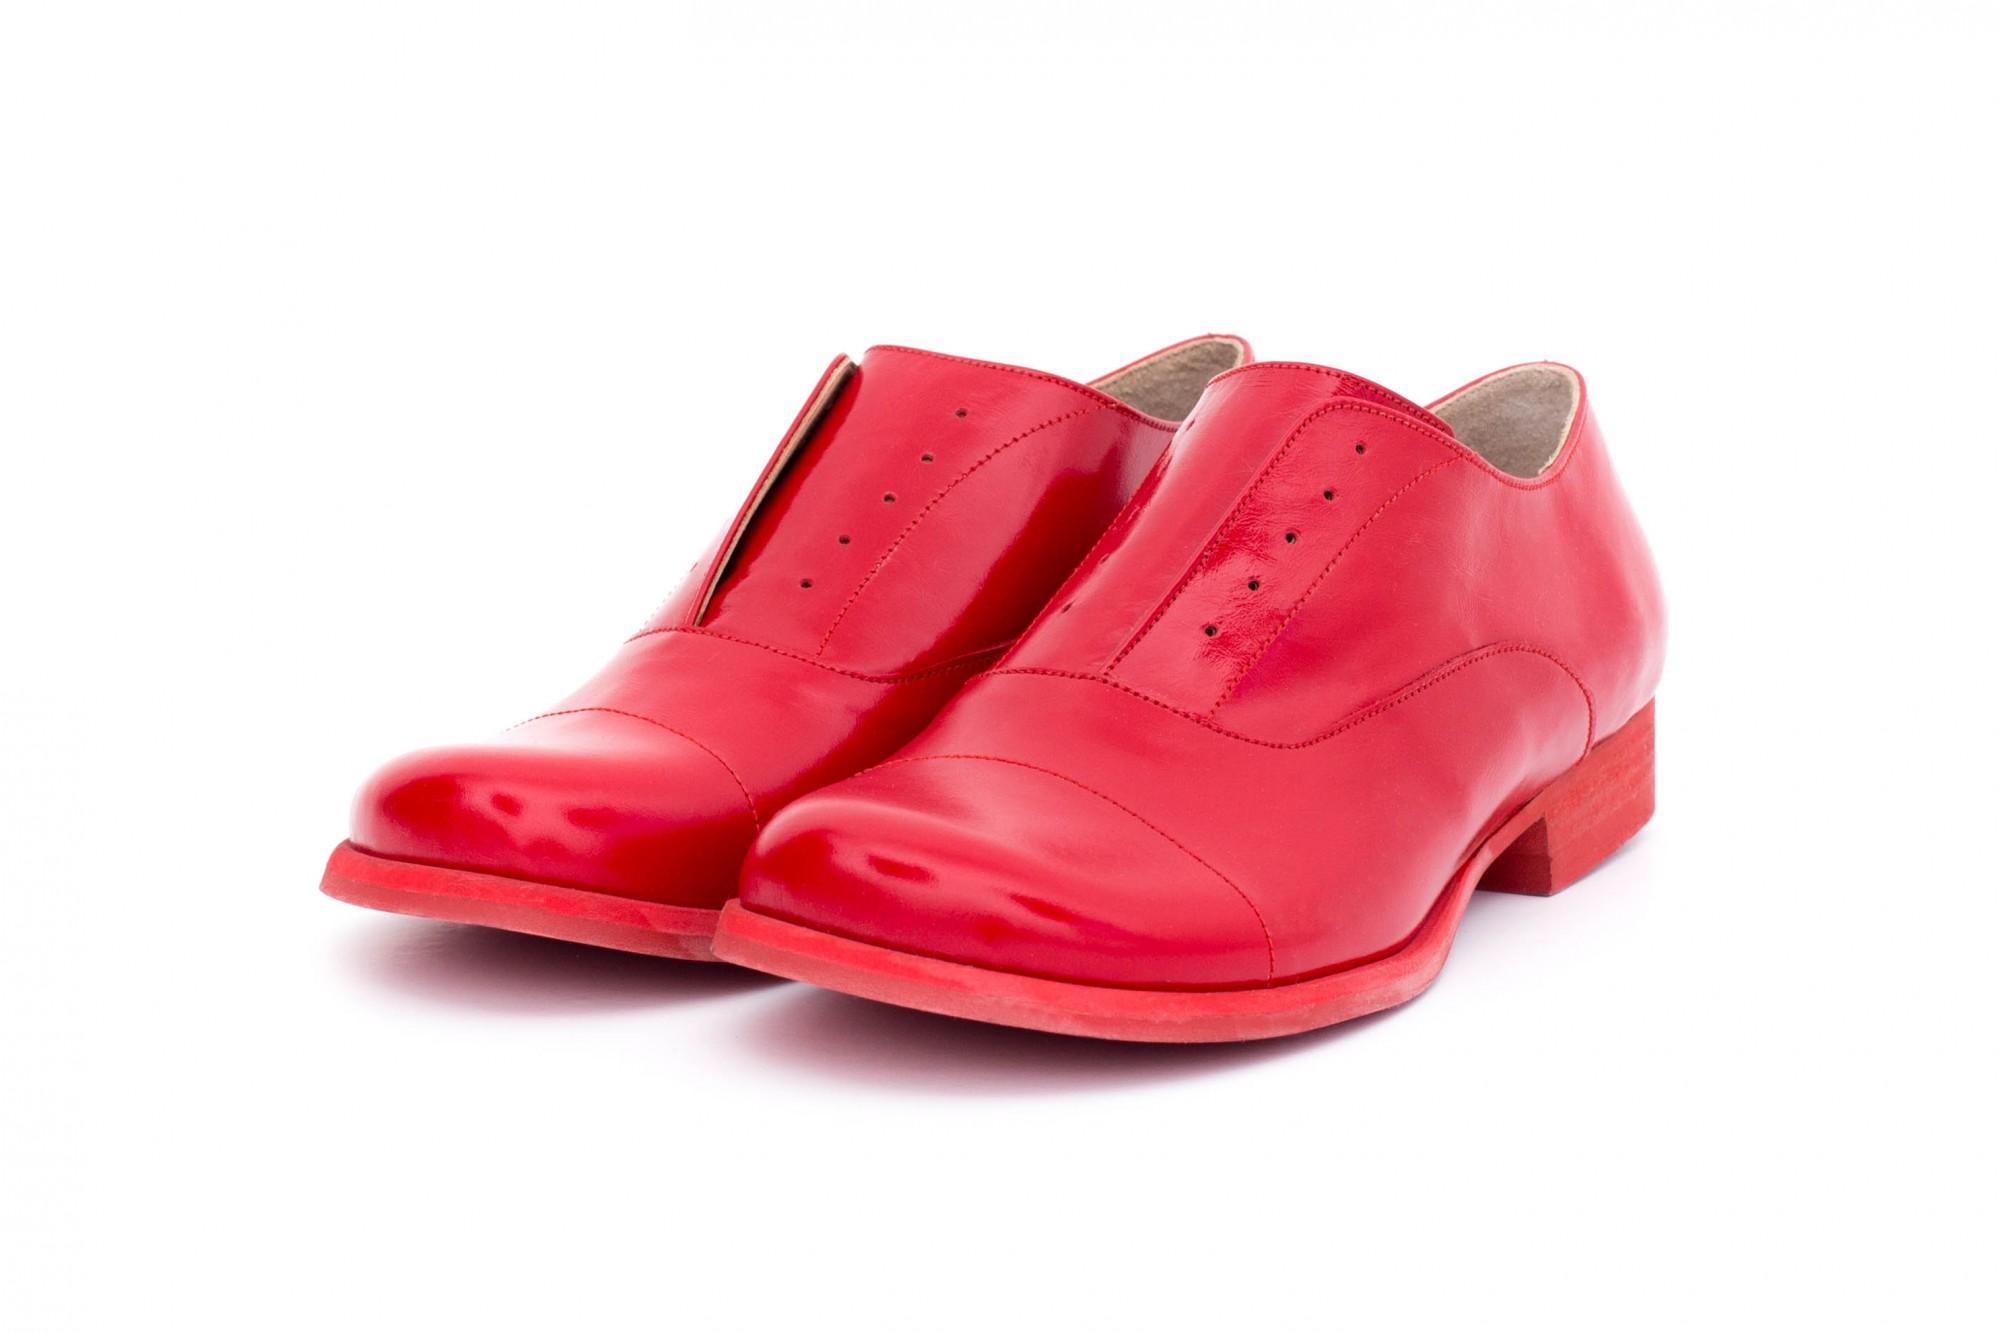 507bc80c33 Handmade leather Shoes - Women's Leather Shoes ... - ADI KILAV